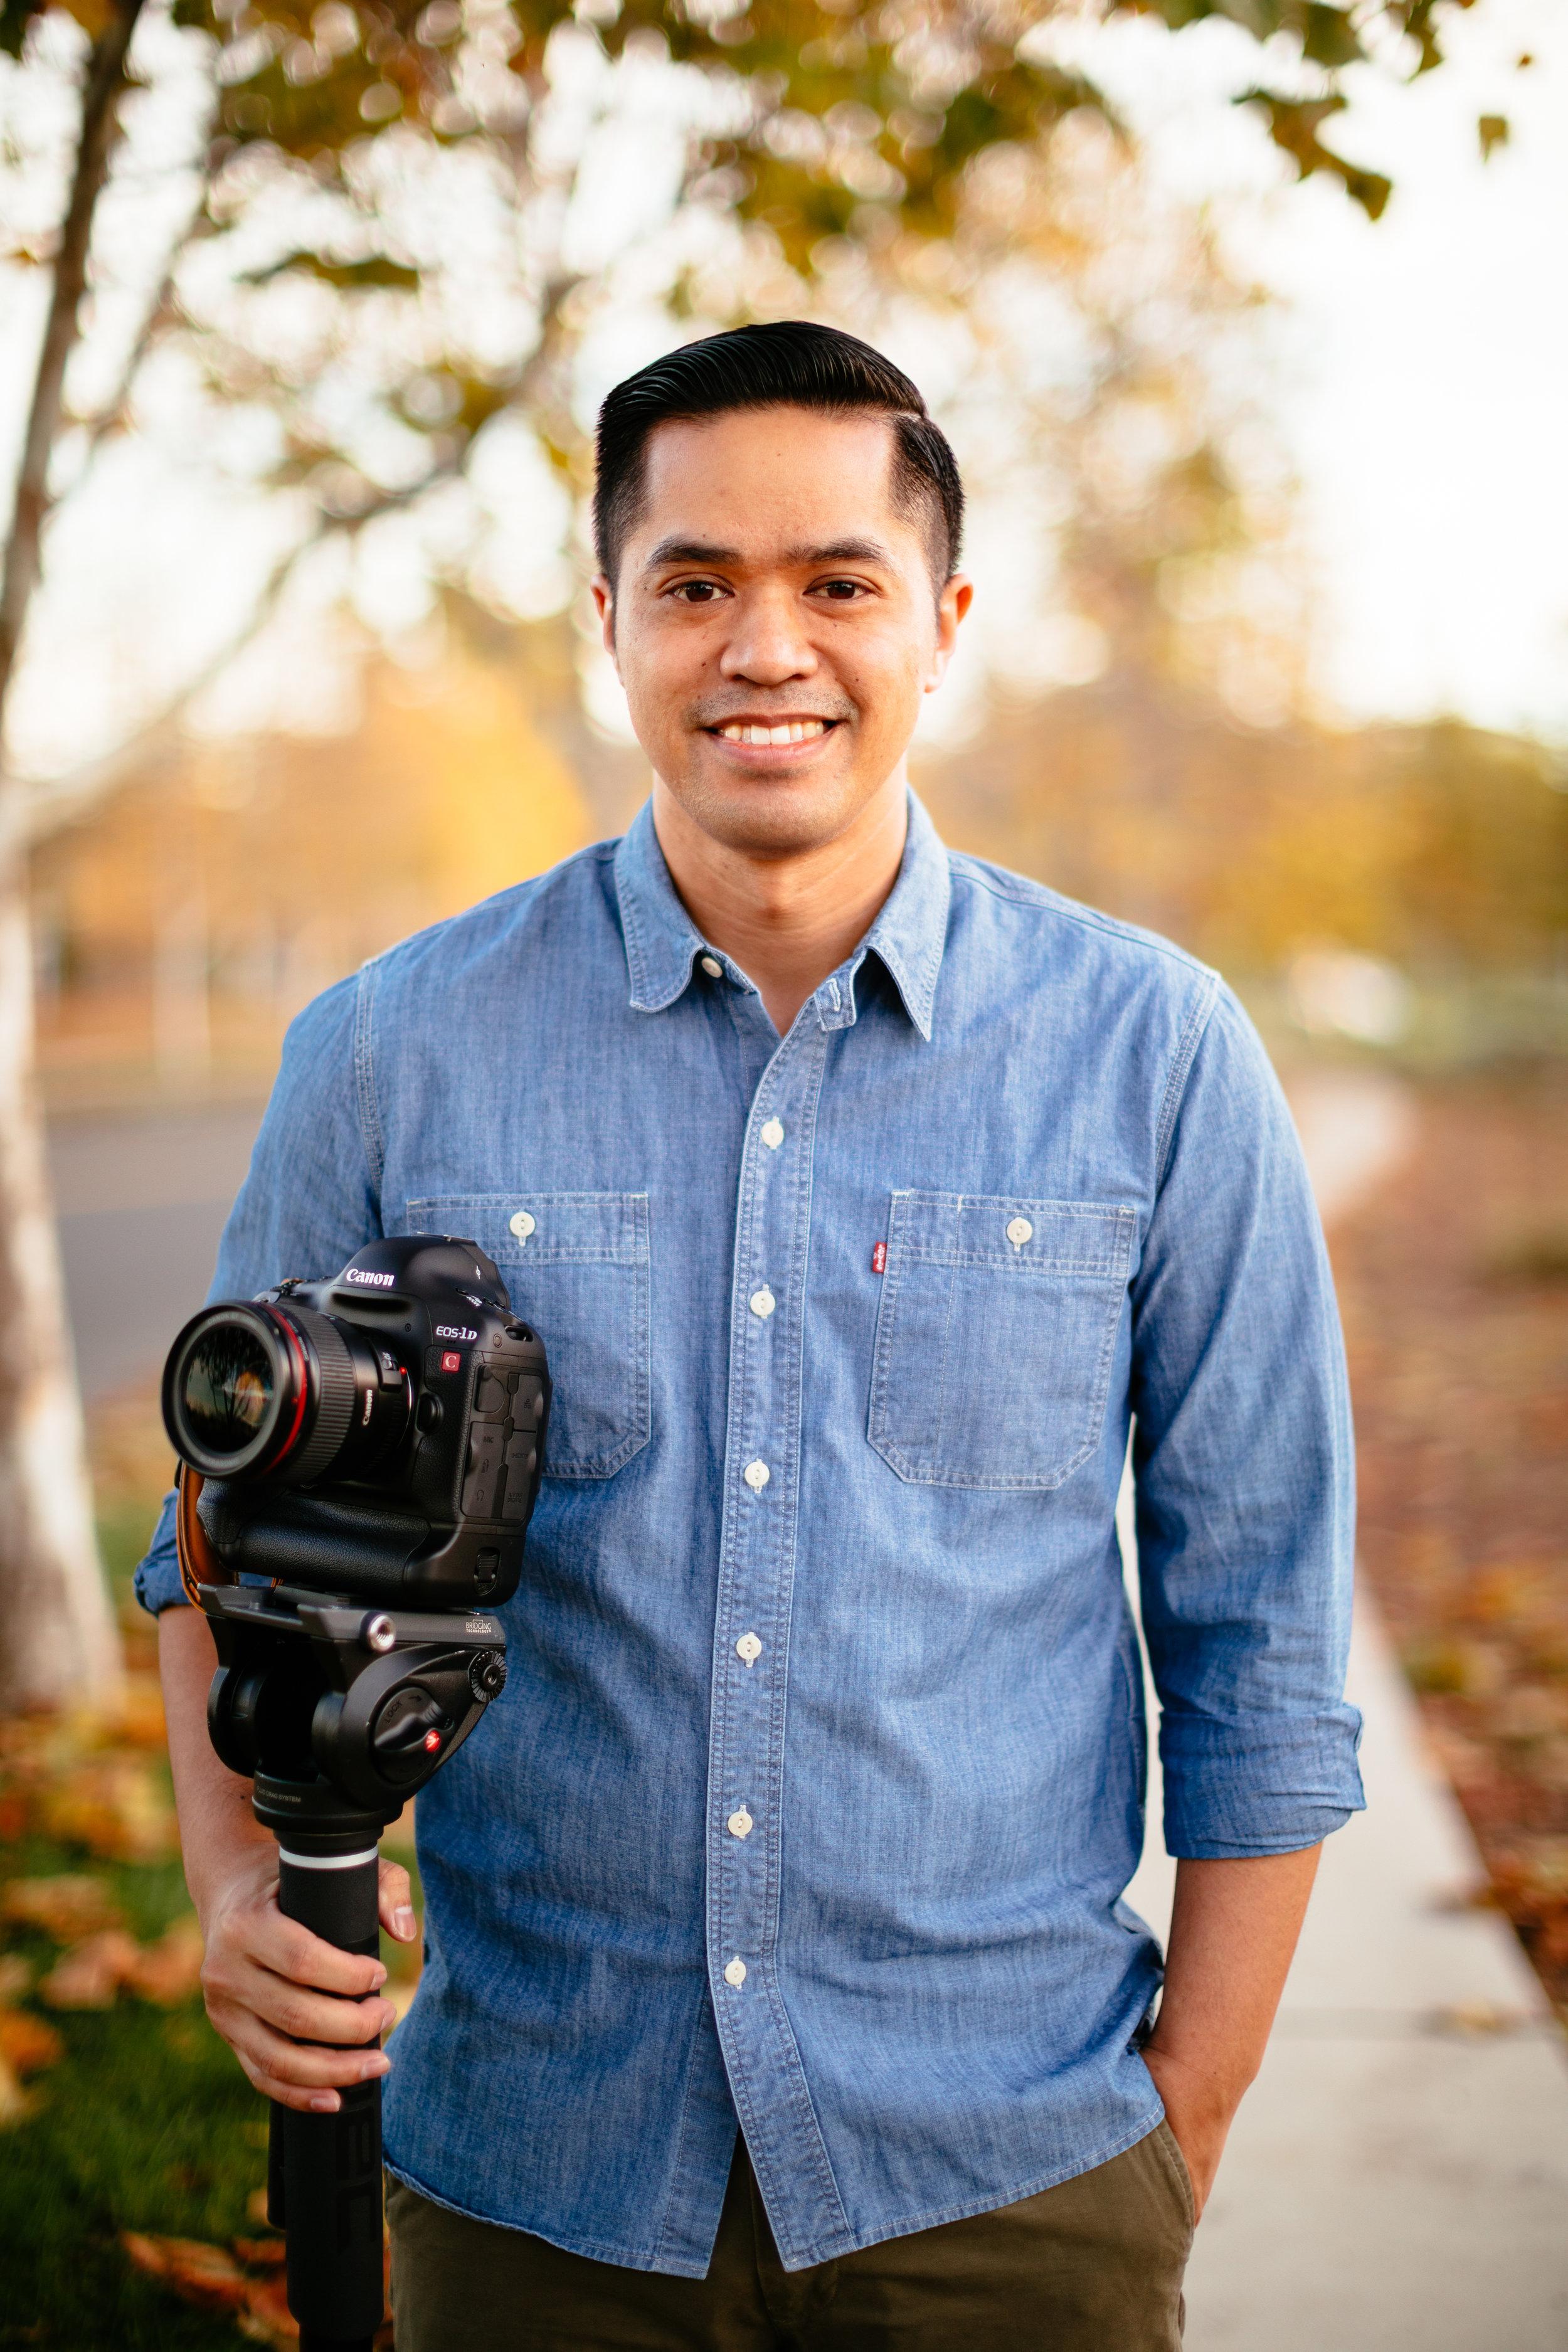 Jeremy Roque - Owner, Cinematographer and Storyteller